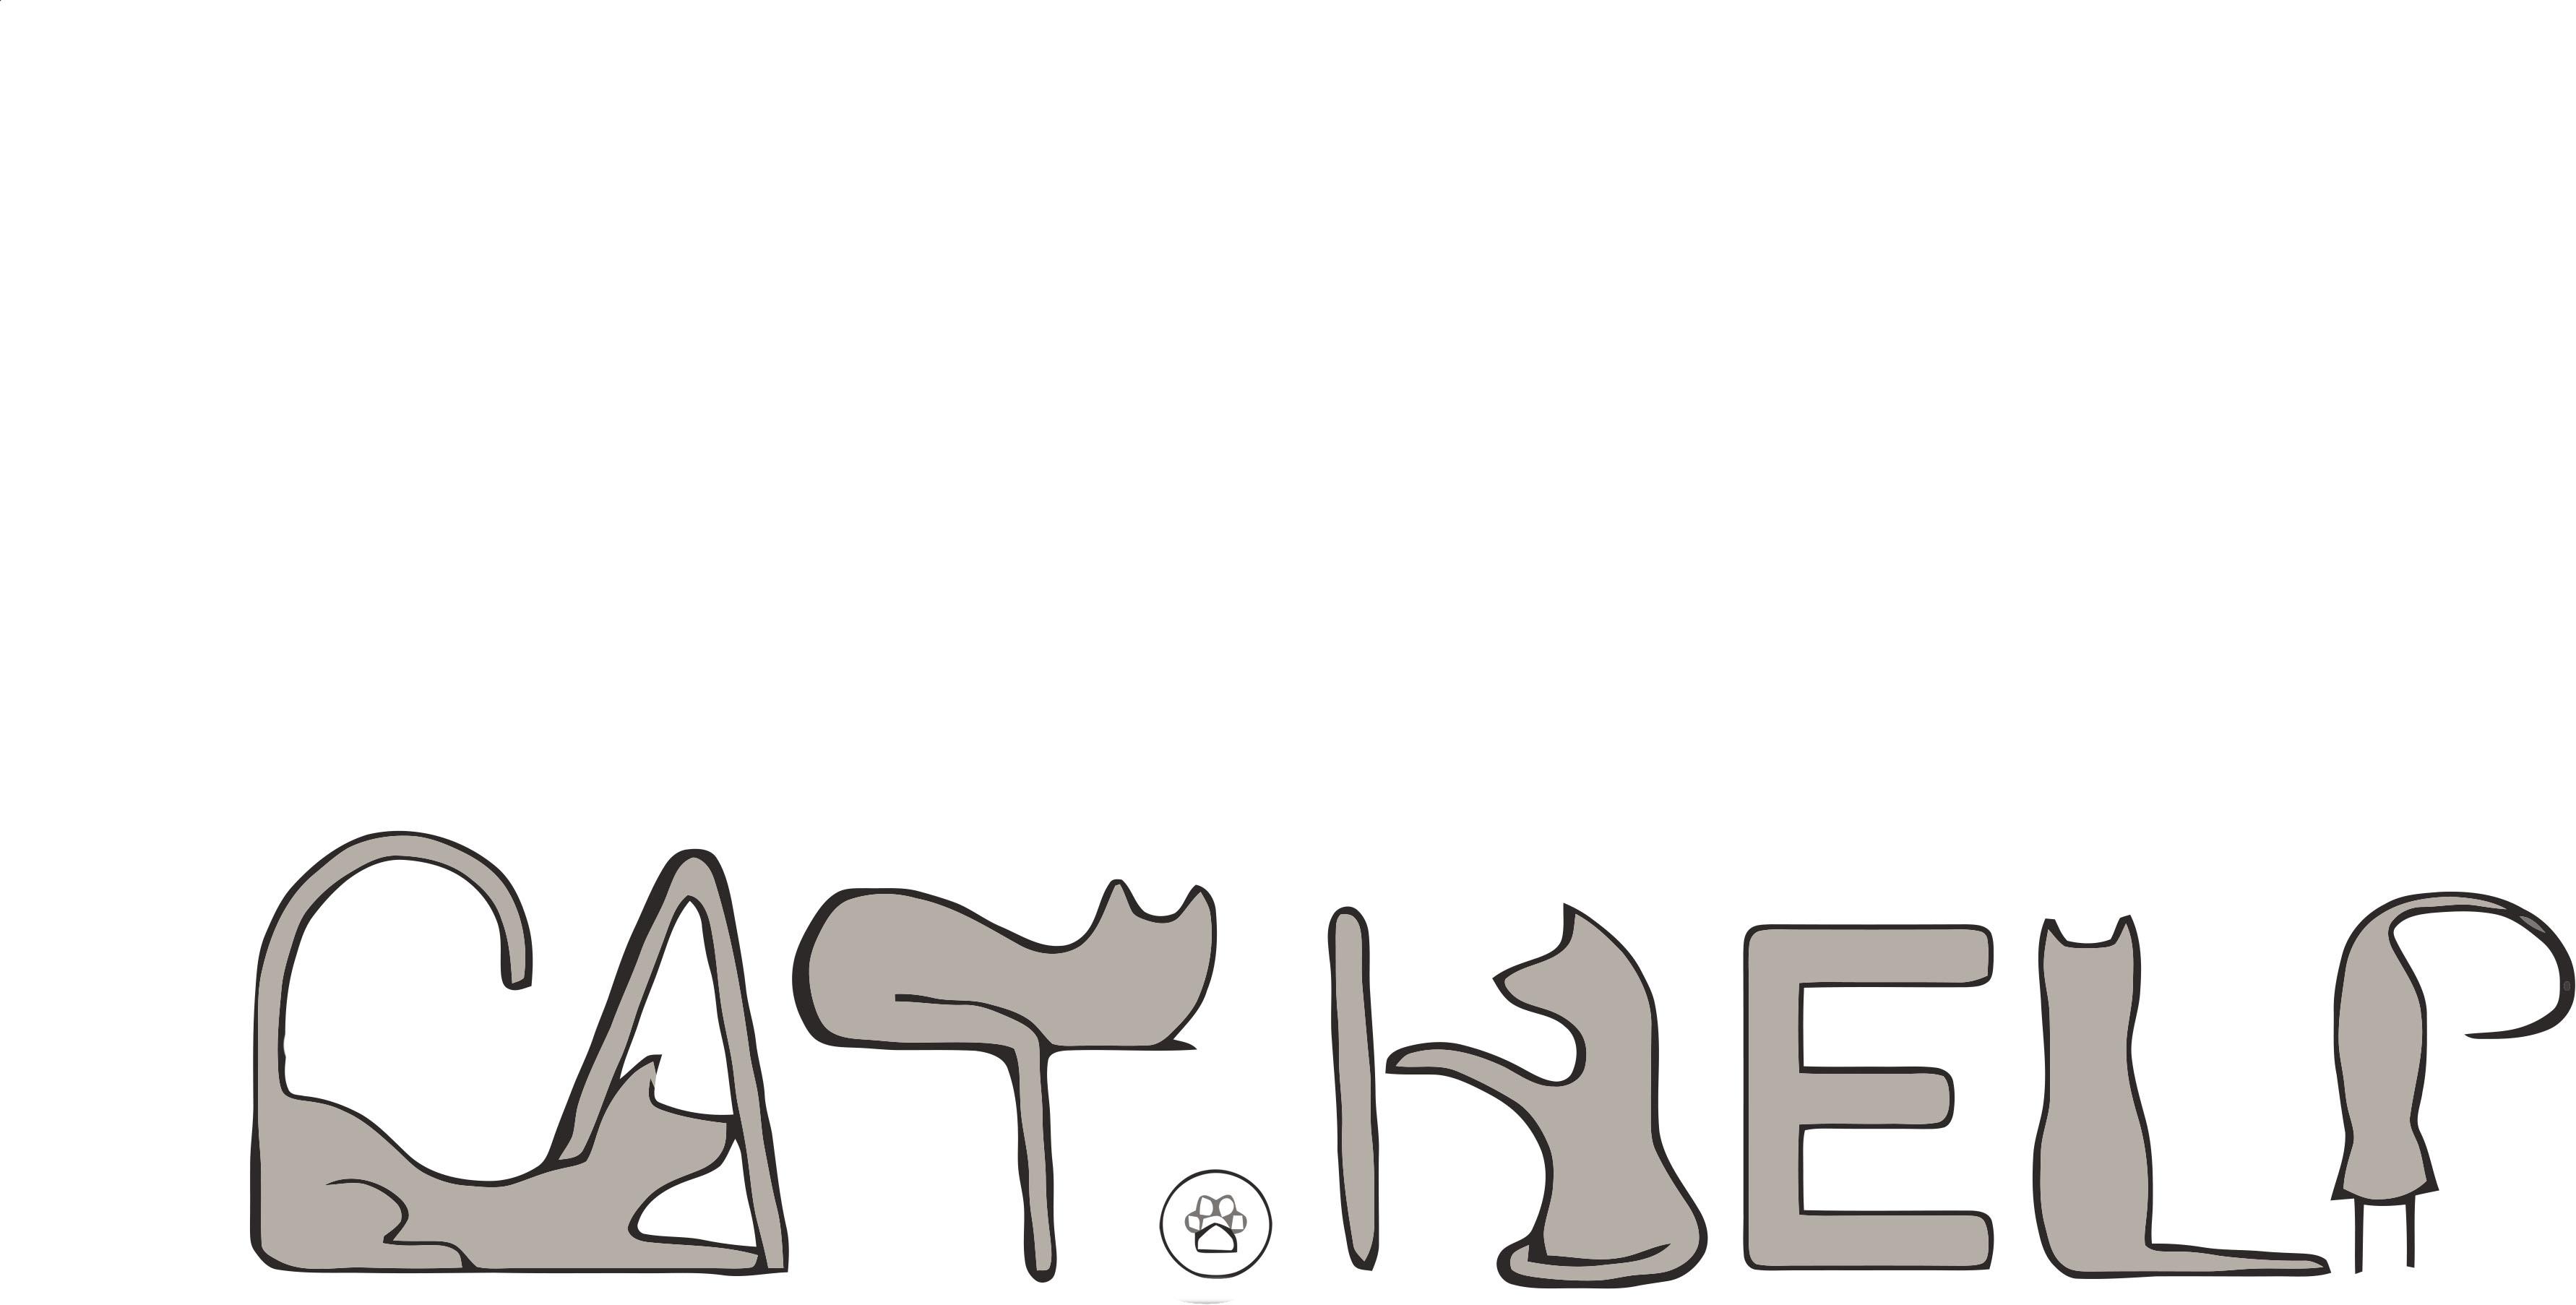 логотип для сайта и группы вк - cat.help фото f_71759dbabf060a75.jpg